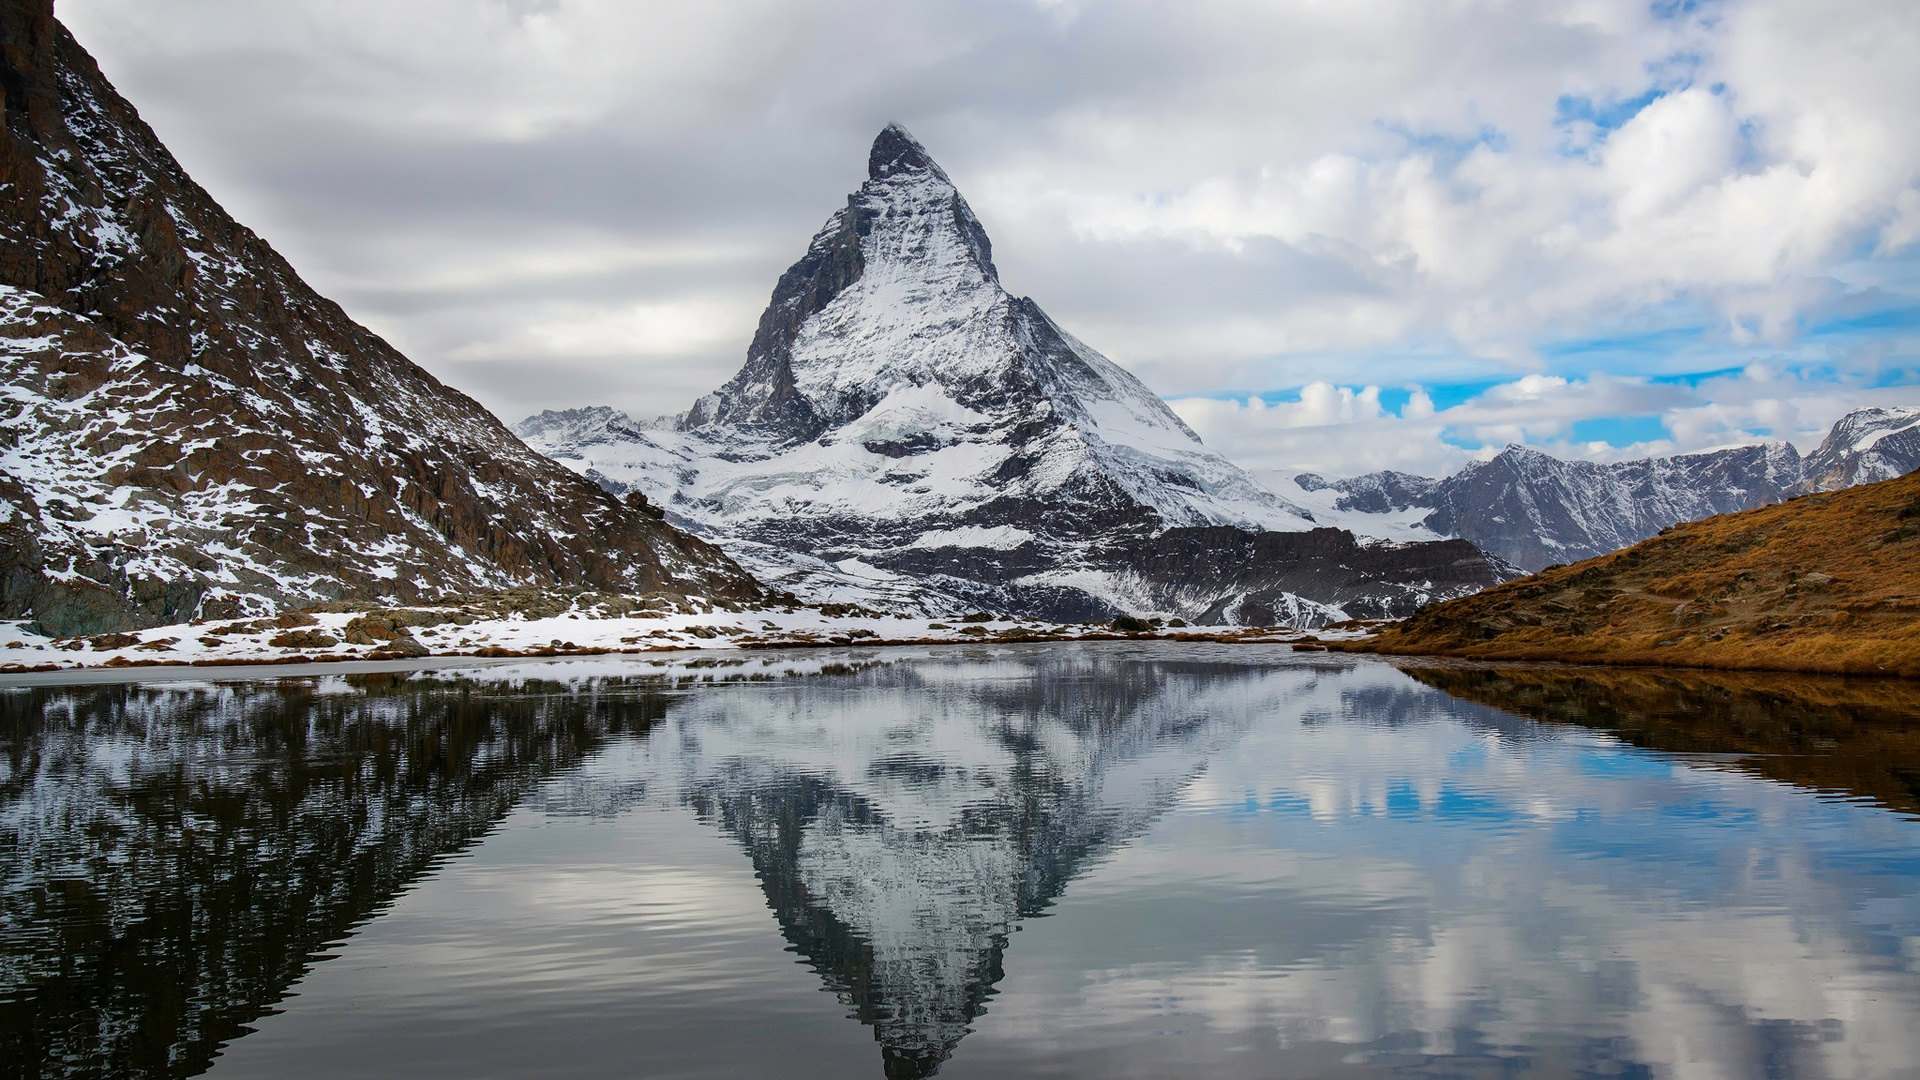 Alps switzerland mountains full hd desktop wallpapers 1080p - Wallpaper 1080p for pc ...